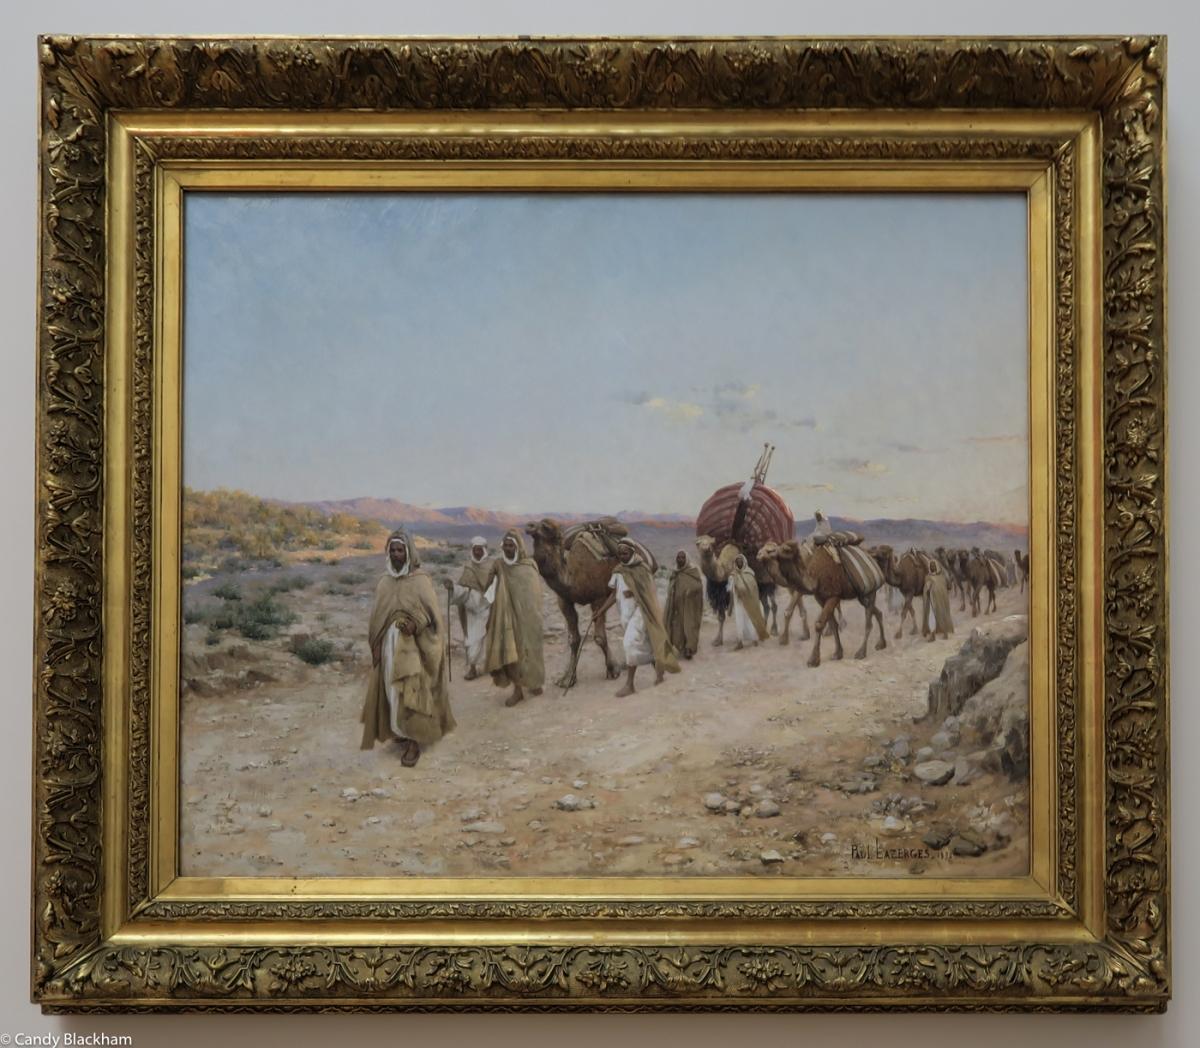 Paul Lazerges, 'Caravan near Biskra, Algeria', 1892